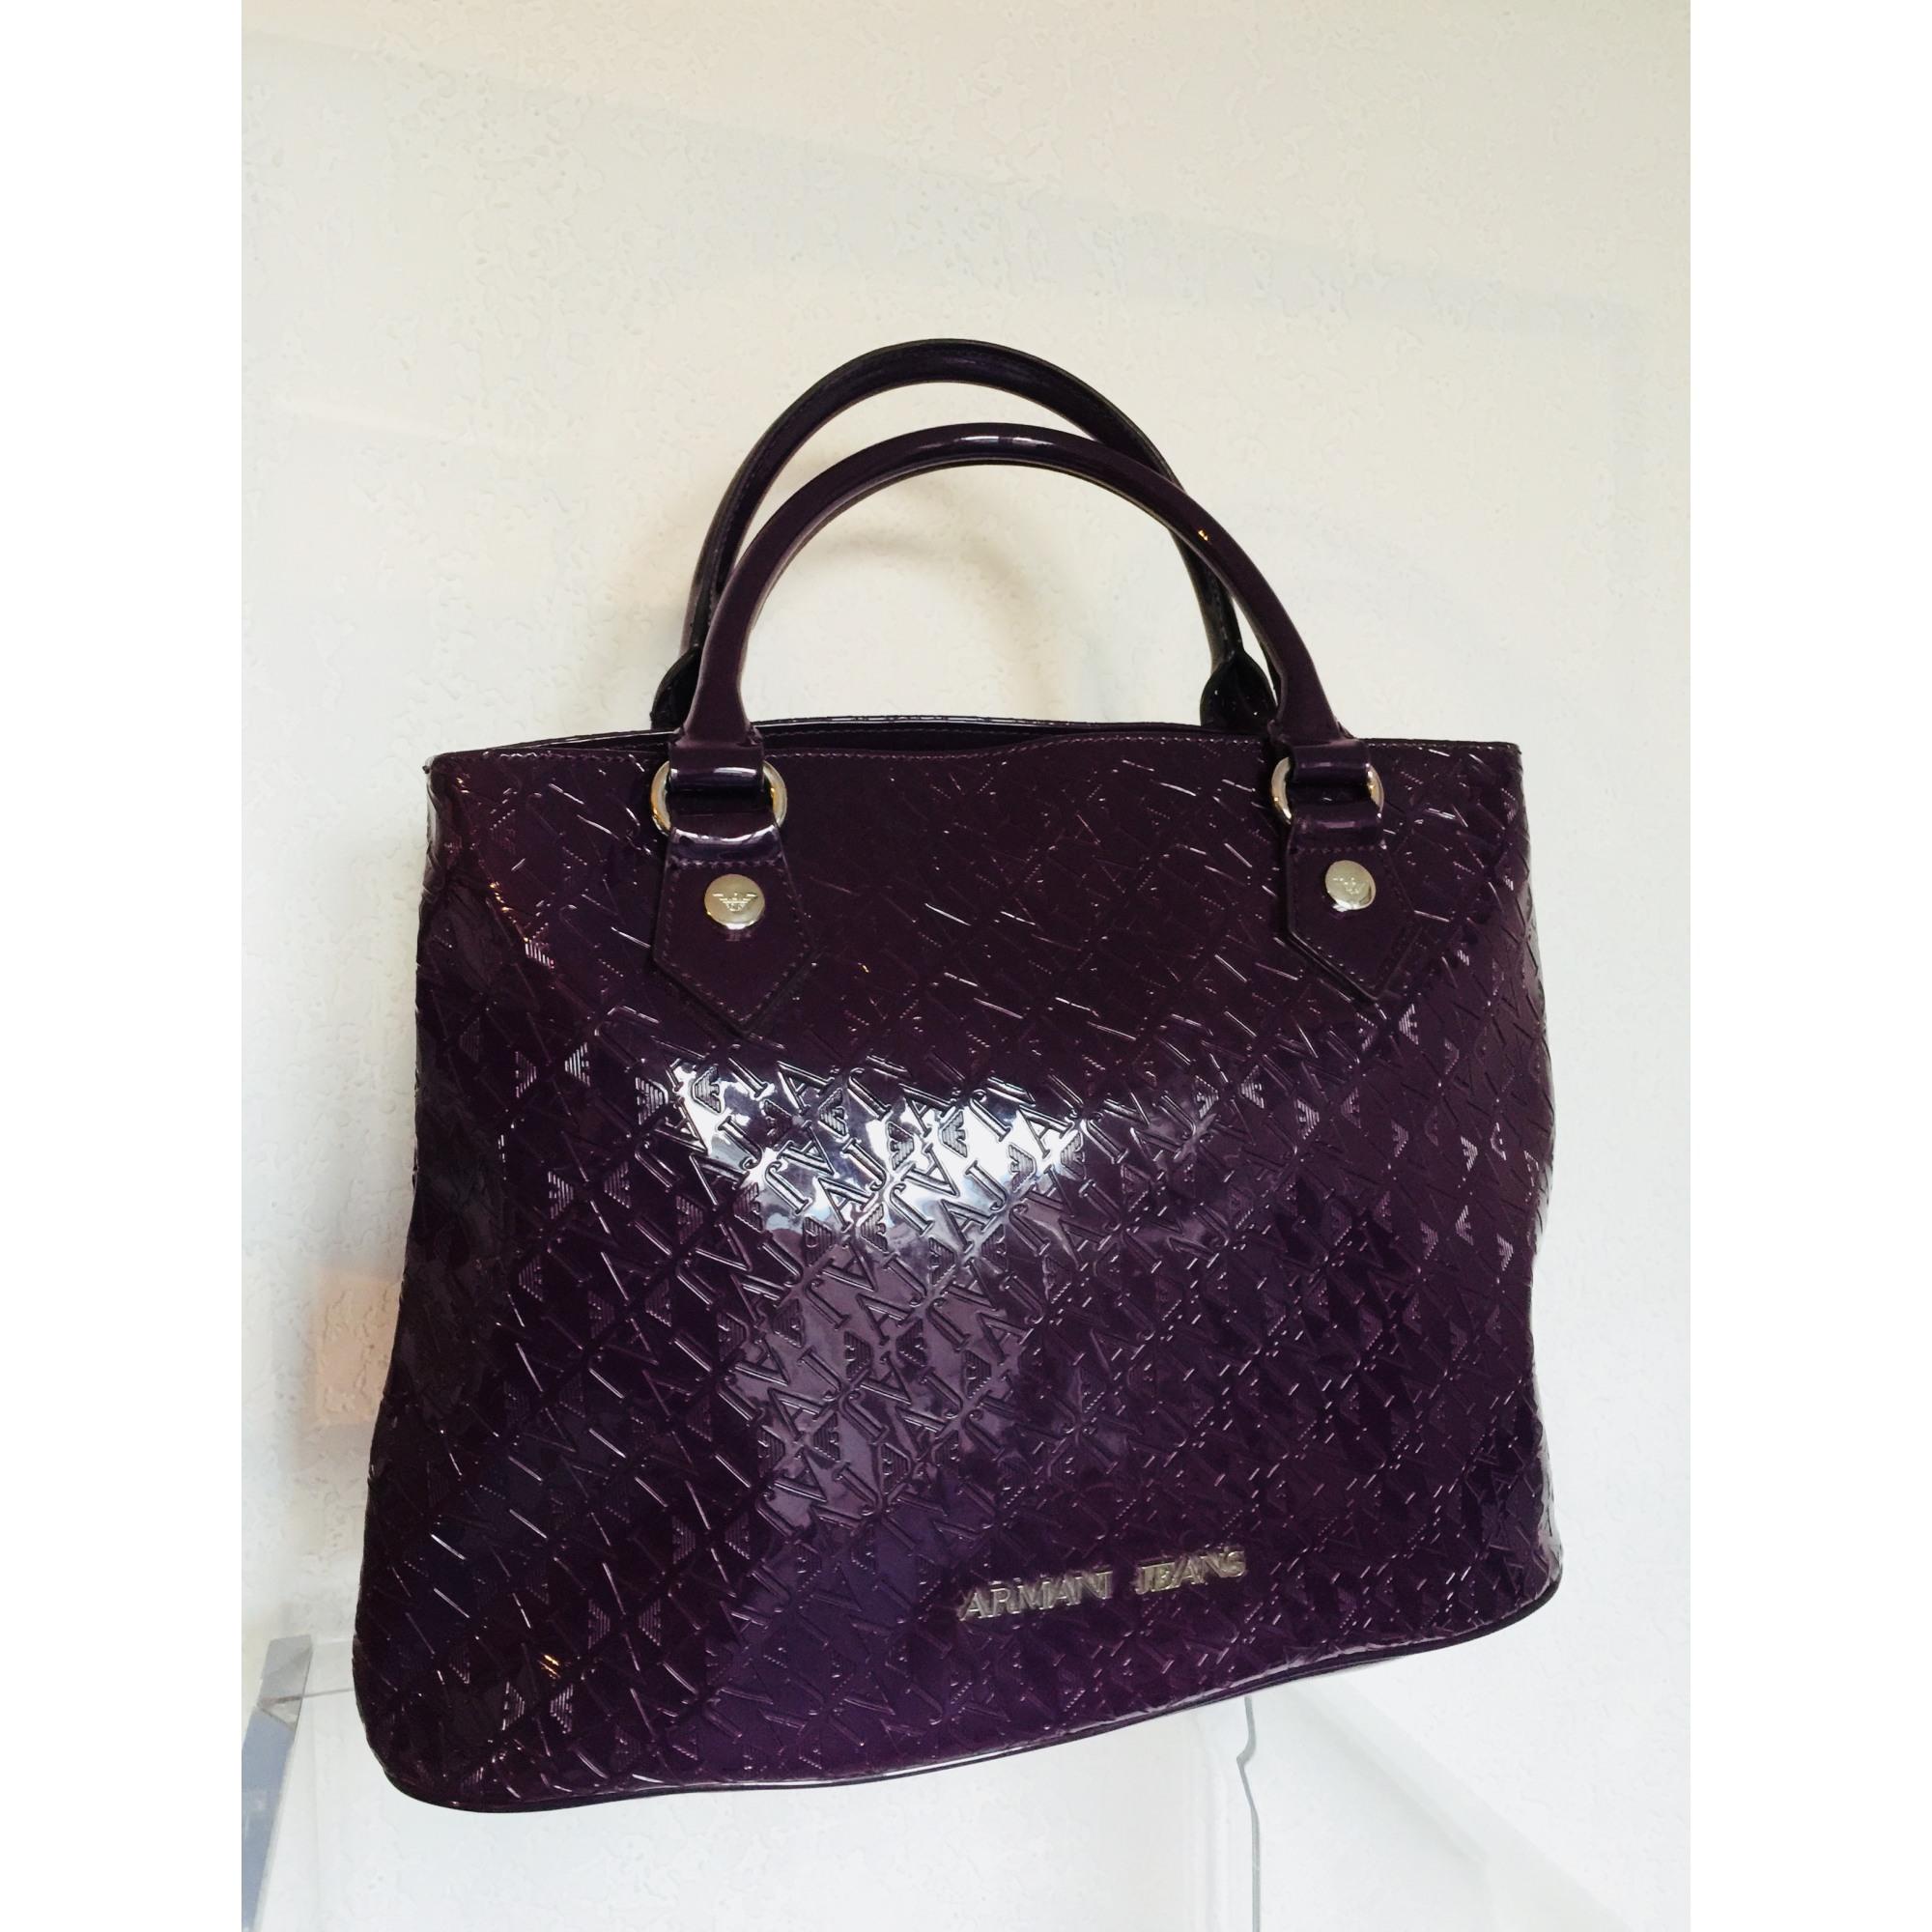 Sac à main en cuir ARMANI JEANS violet vendu par Isula dressing ... f4eaae1fbc5